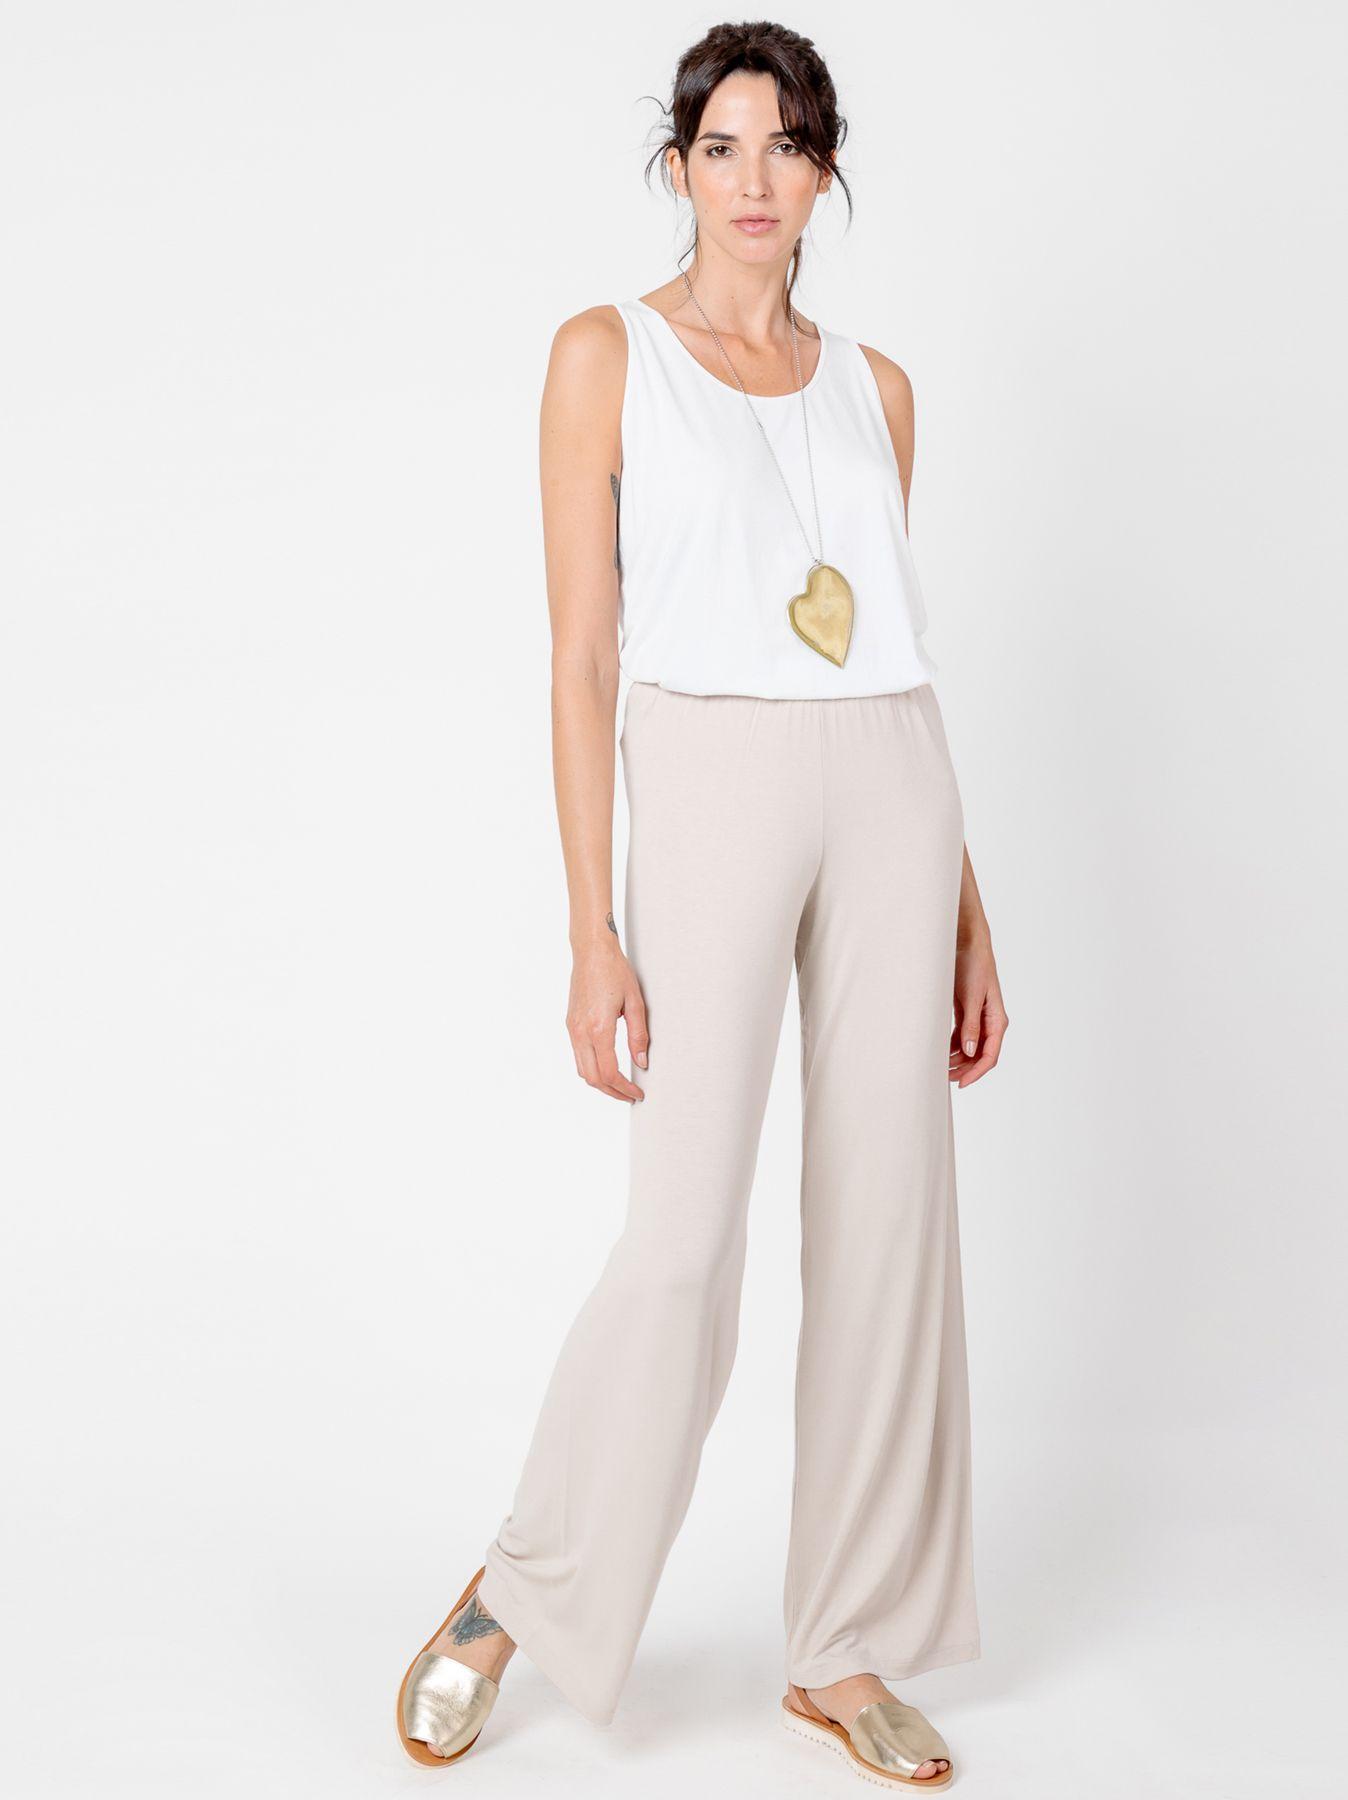 Pantalone elastico BIANCO NATURALE